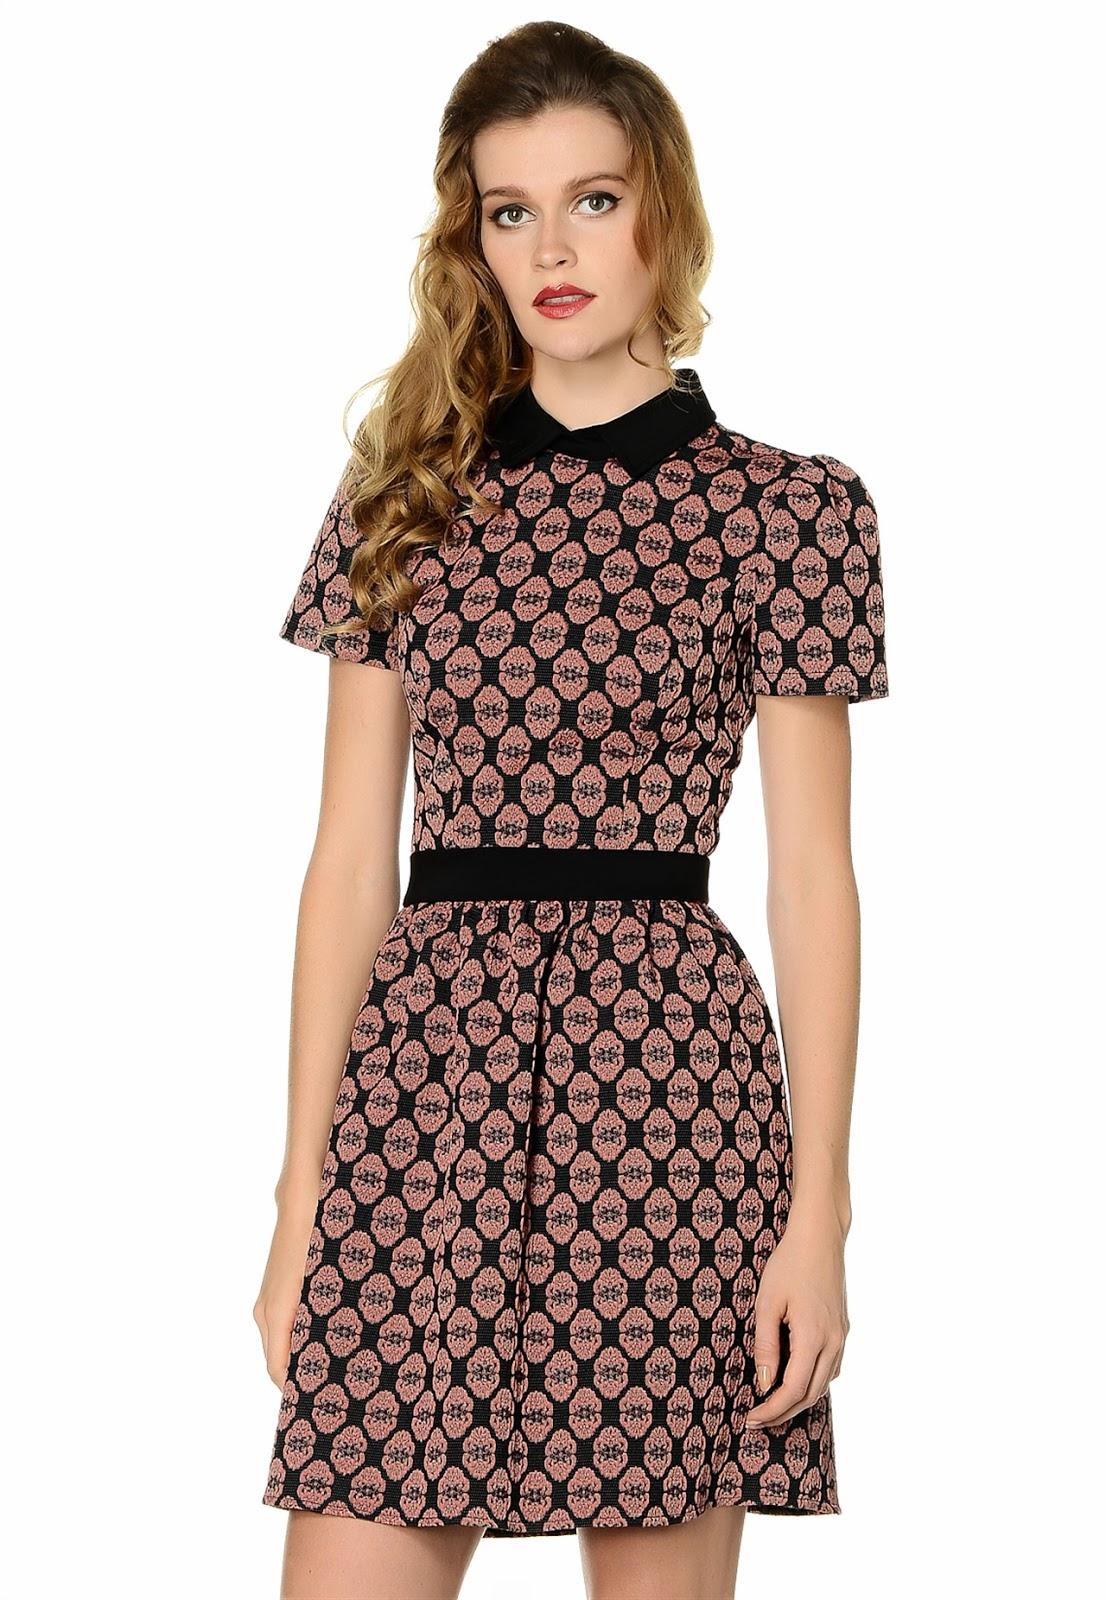 desenli elbise, kemerli elbise, retro elbise, kısa elbise, 2015 elbise modelleri, adil ışık elbise